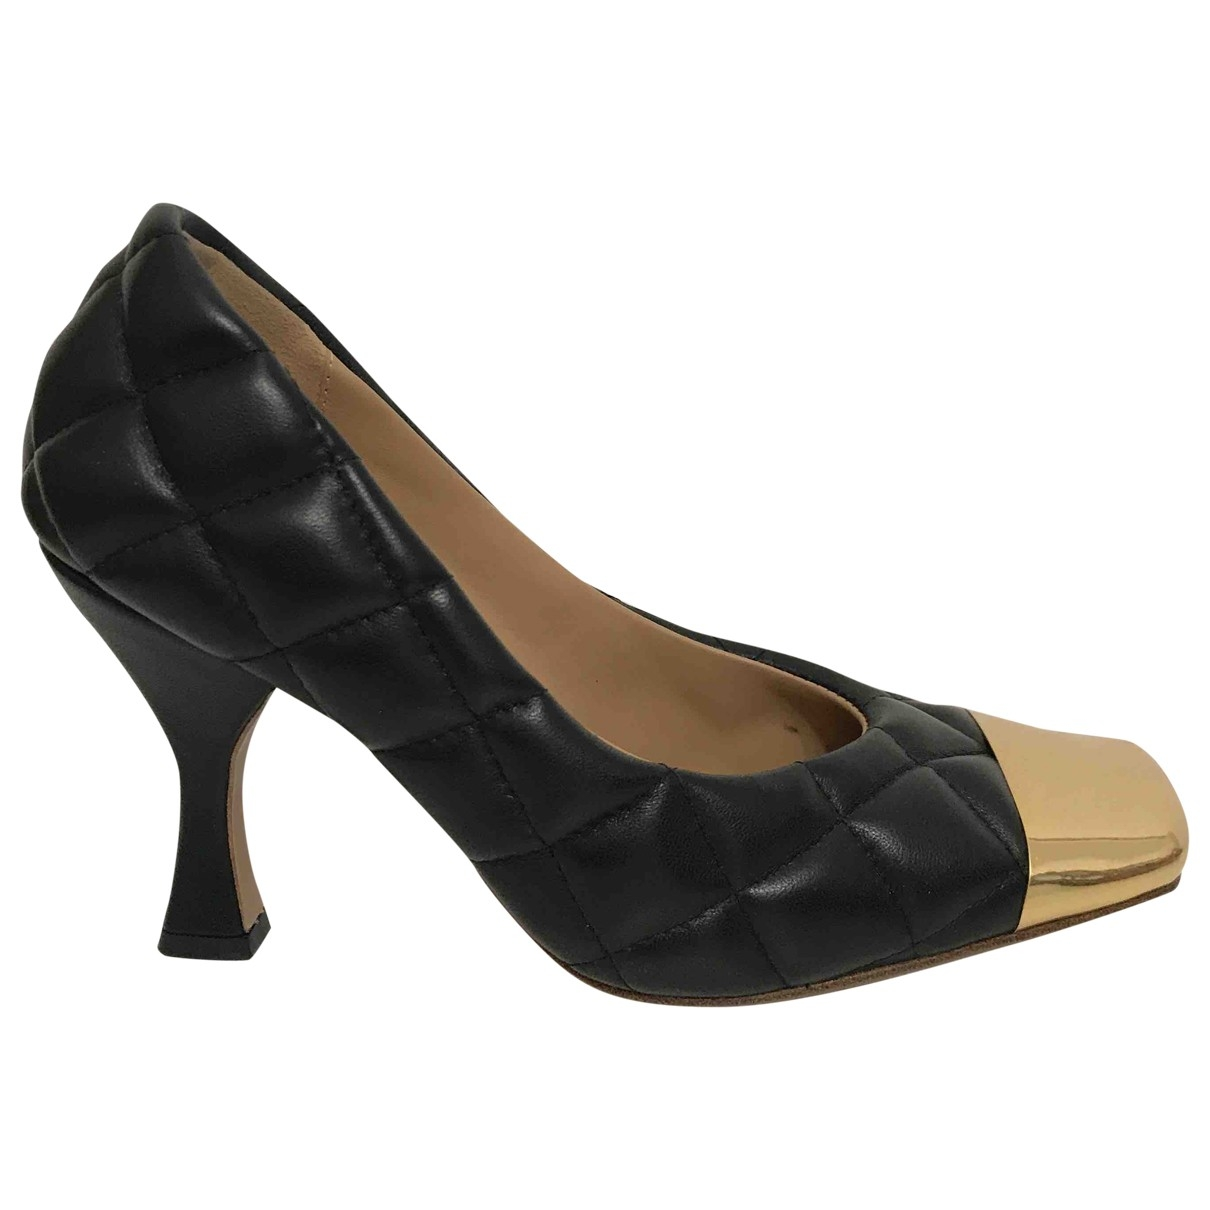 Bottega Veneta Almond Black Leather Heels for Women 35 EU